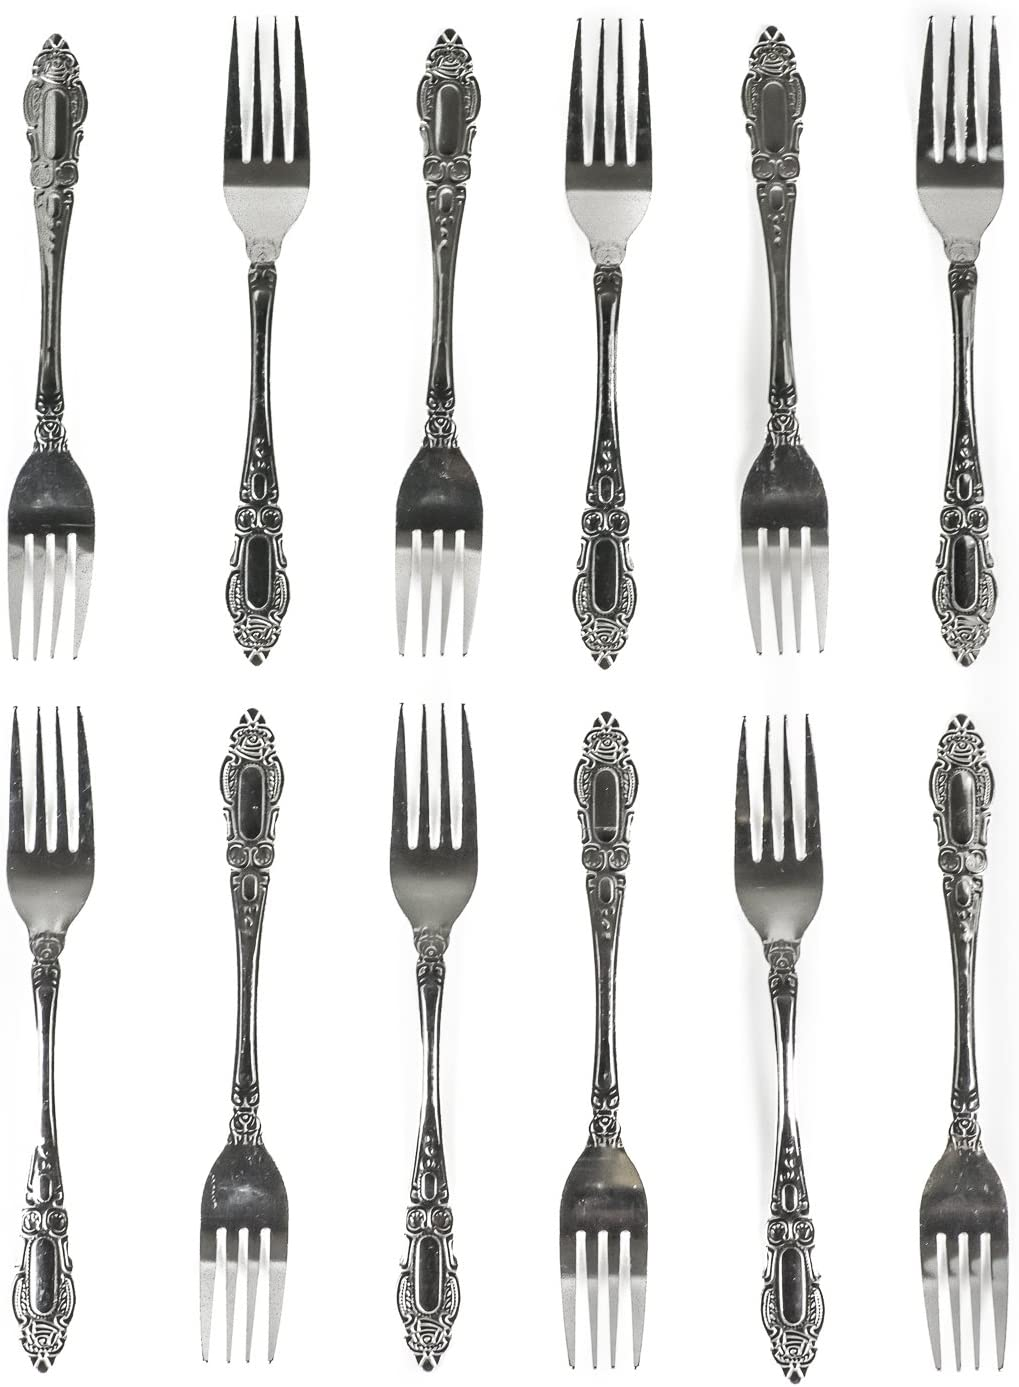 DecorRack Dinner Forks, Stainless Steel Table Forks, Flatware (Set of 12)